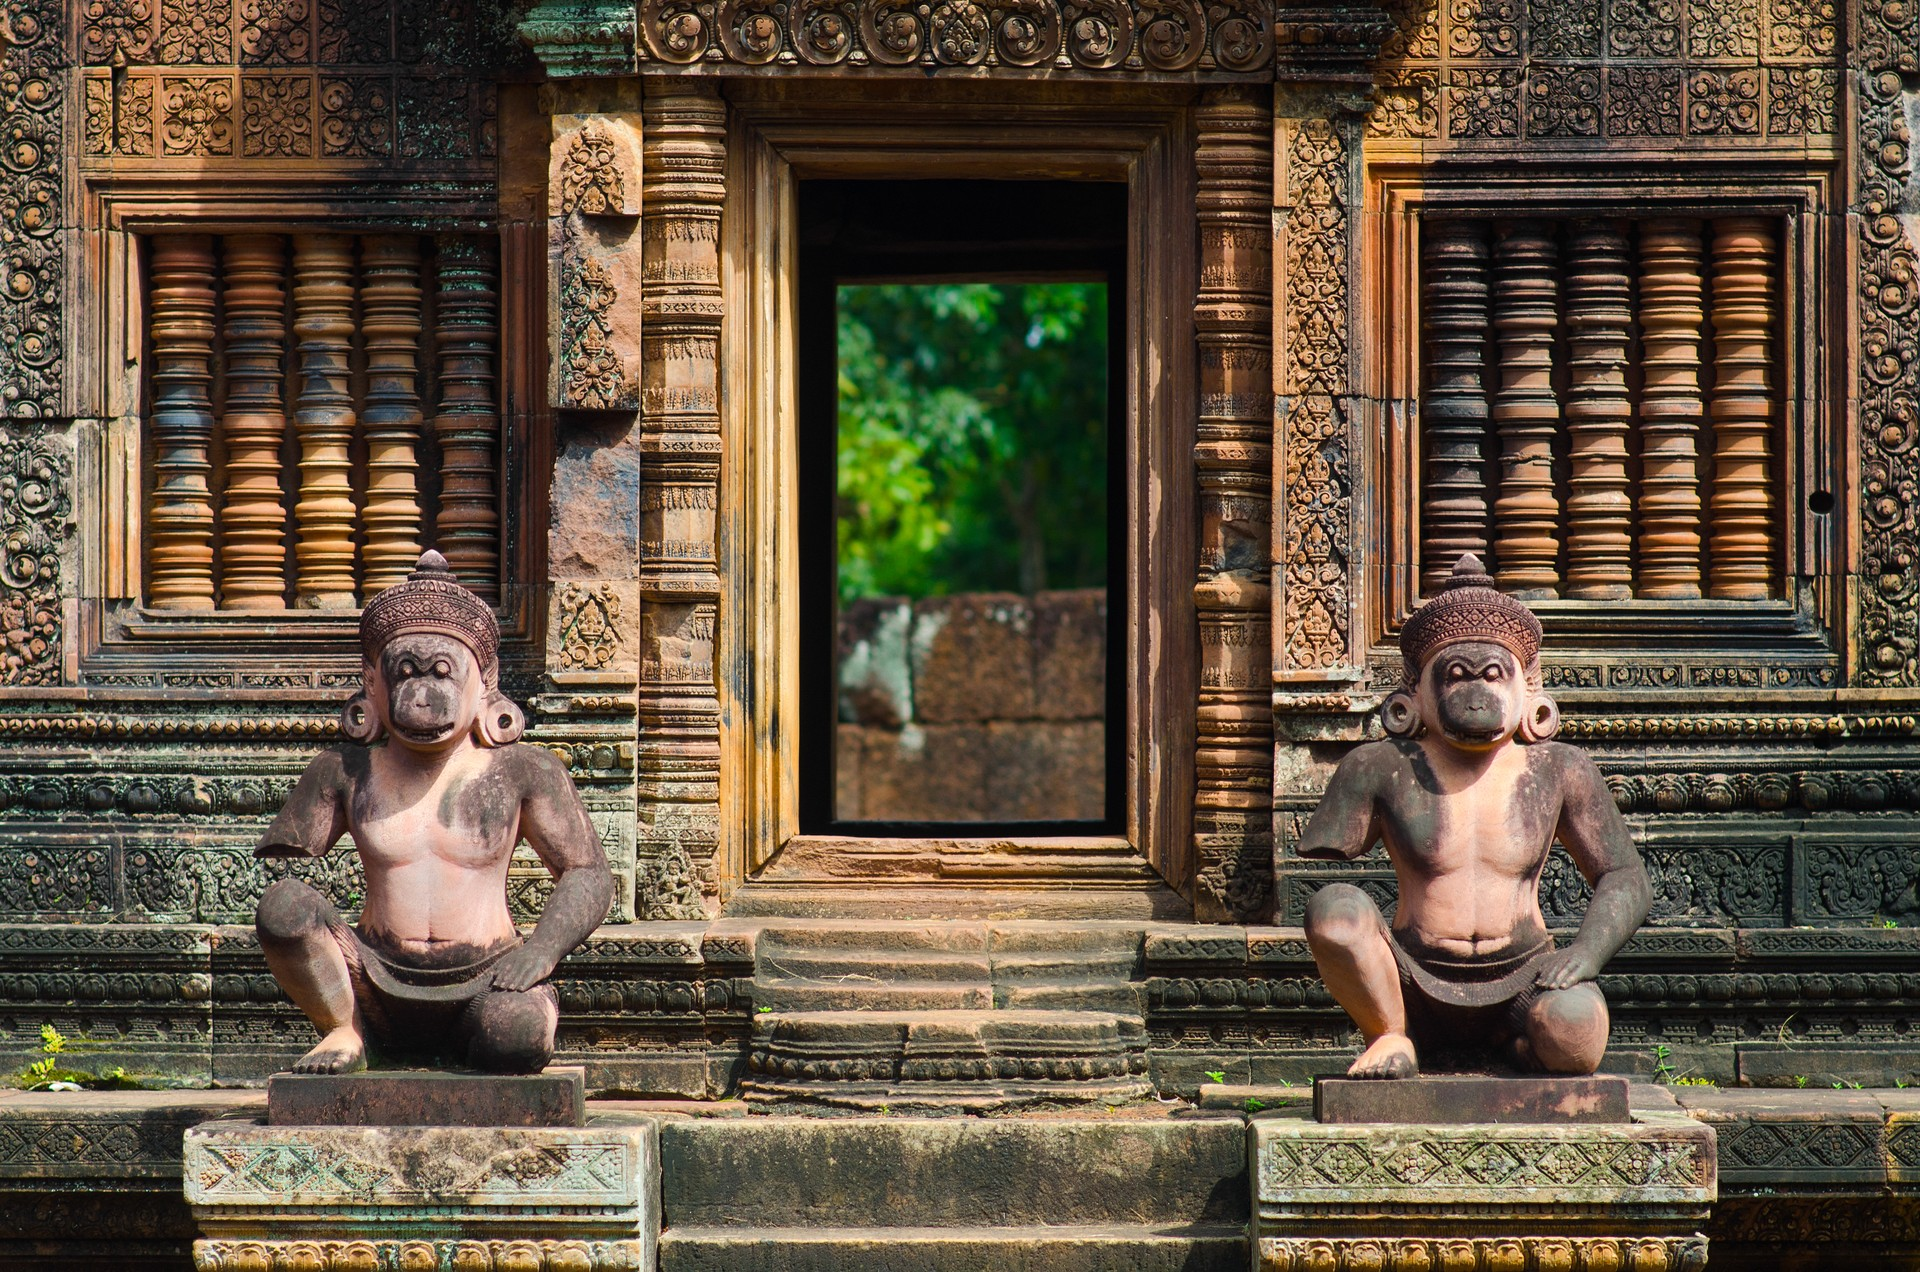 Bird guardians of Banteay Srei temple near Siem Reap, Cambodia